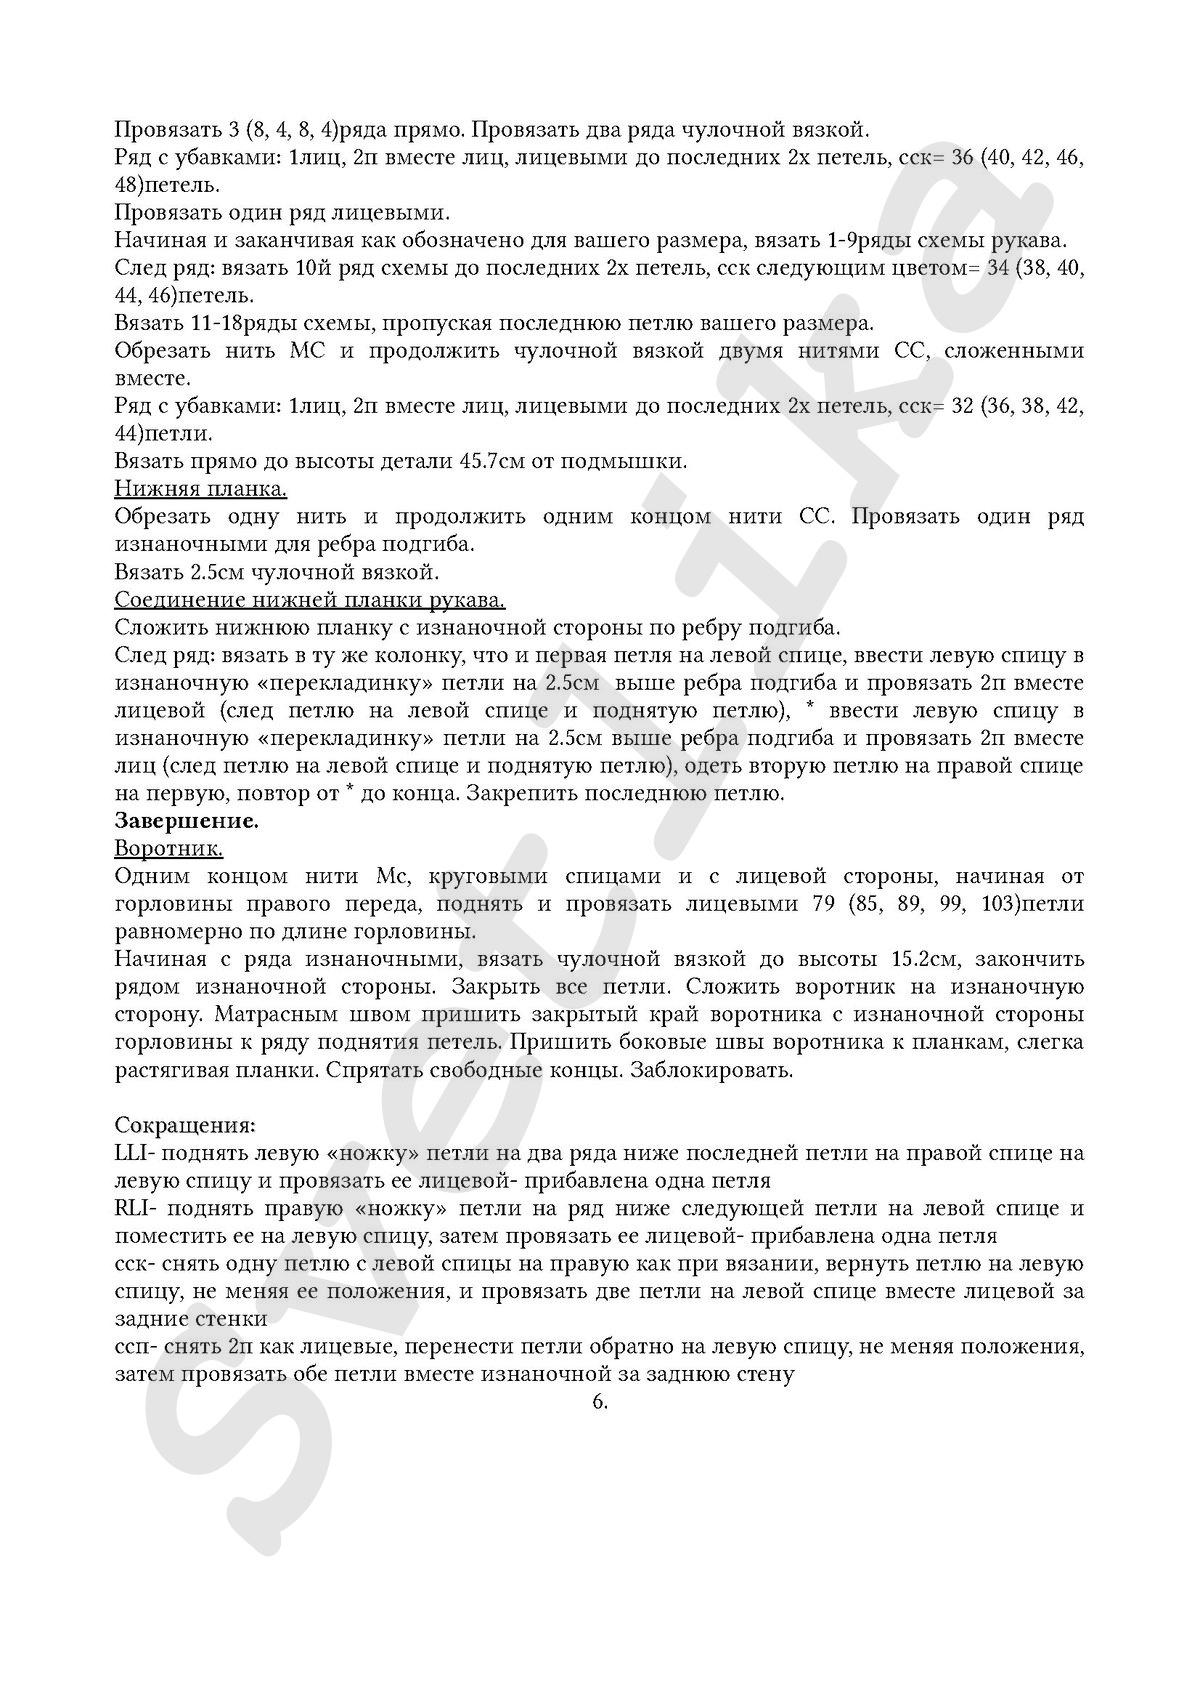 https://img-fotki.yandex.ru/get/894414/125862467.117/0_1d3e6c_ef569fdc_orig